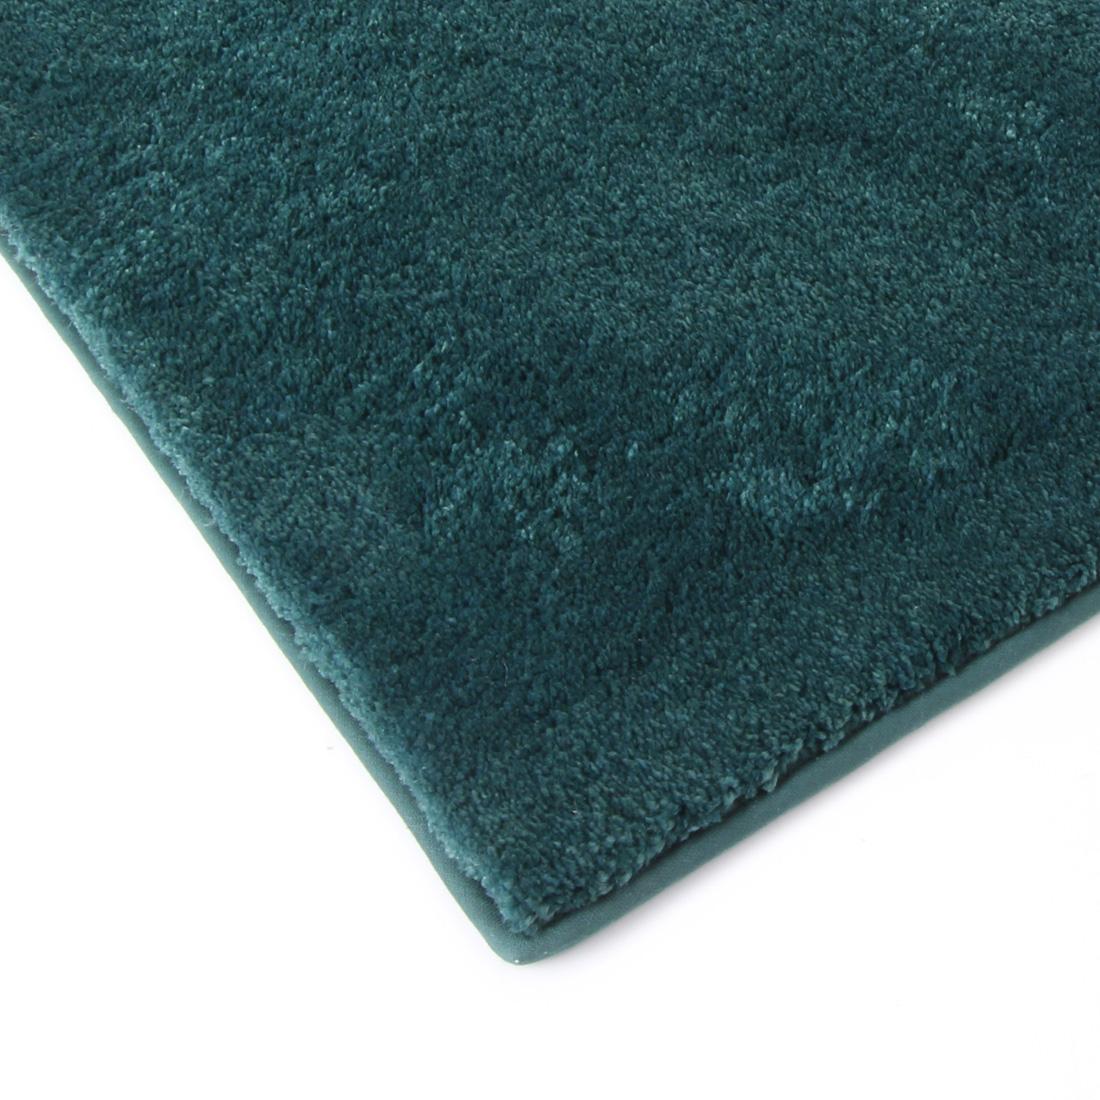 Vloerkleed Xilento Touch Azure Green (extra zacht)